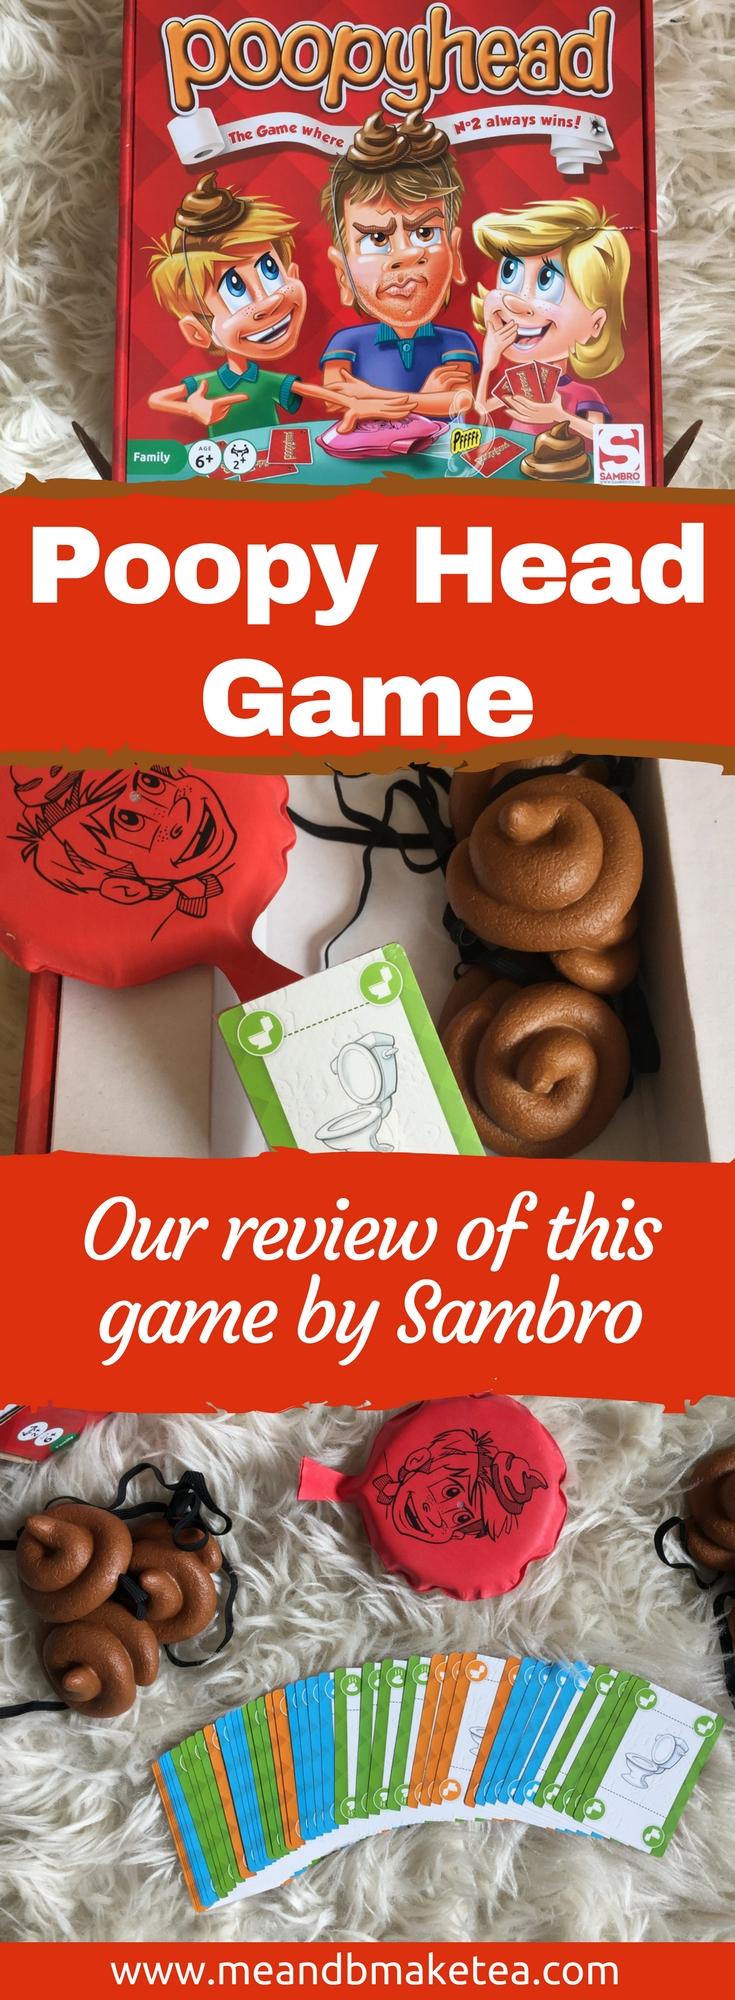 poopy head sambro game